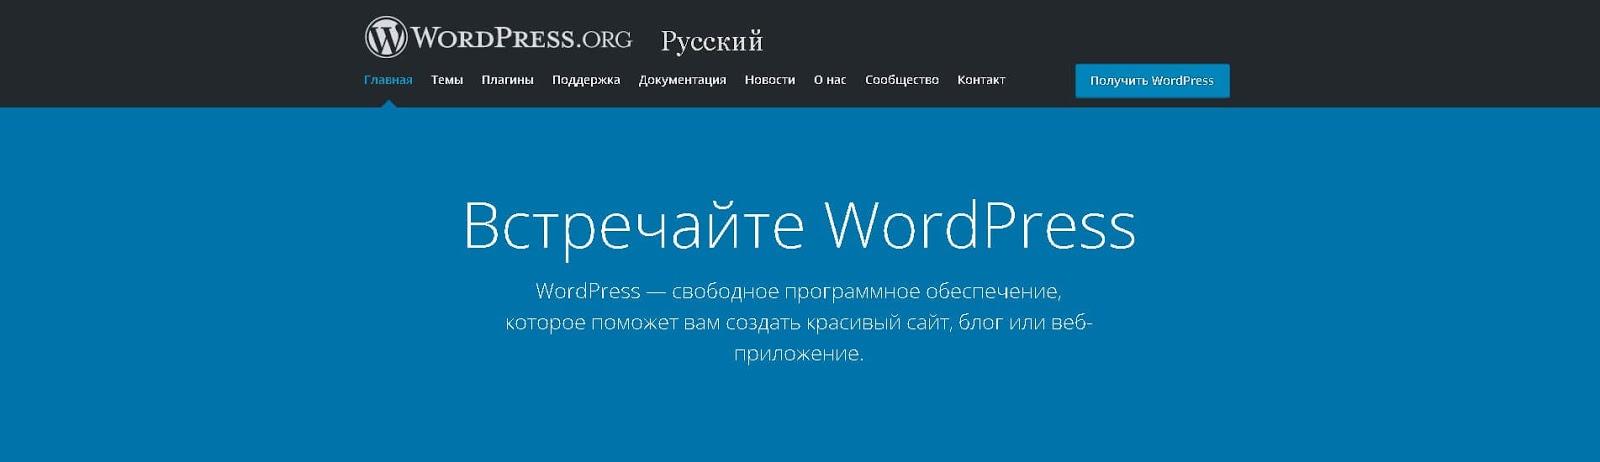 wordpress-org-glavnaya-stranicza